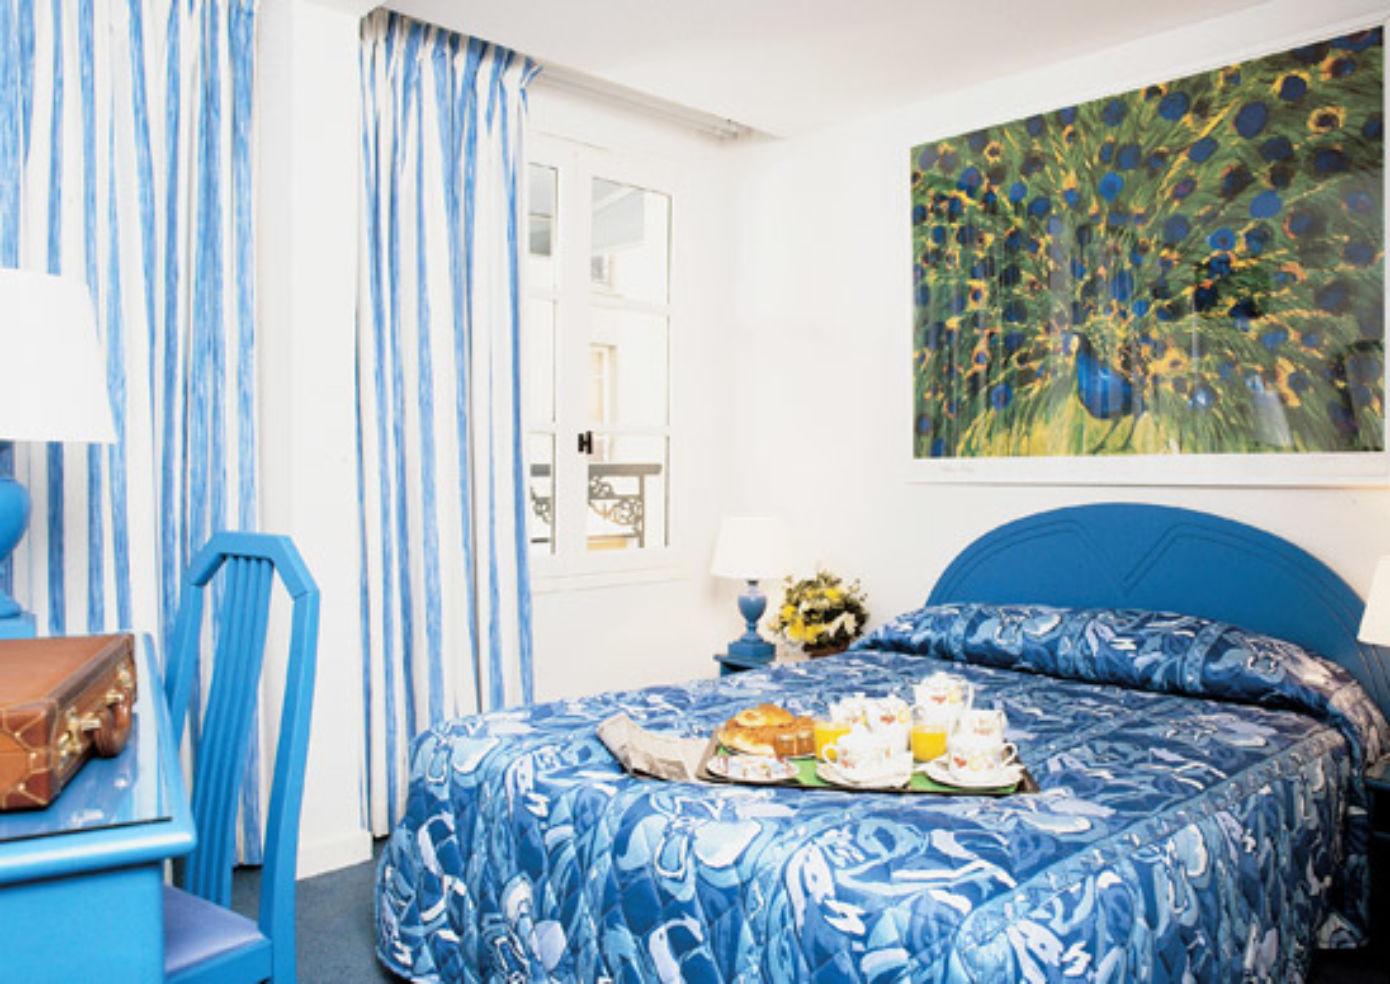 A guest room at the Hôtel Croix de Malte.